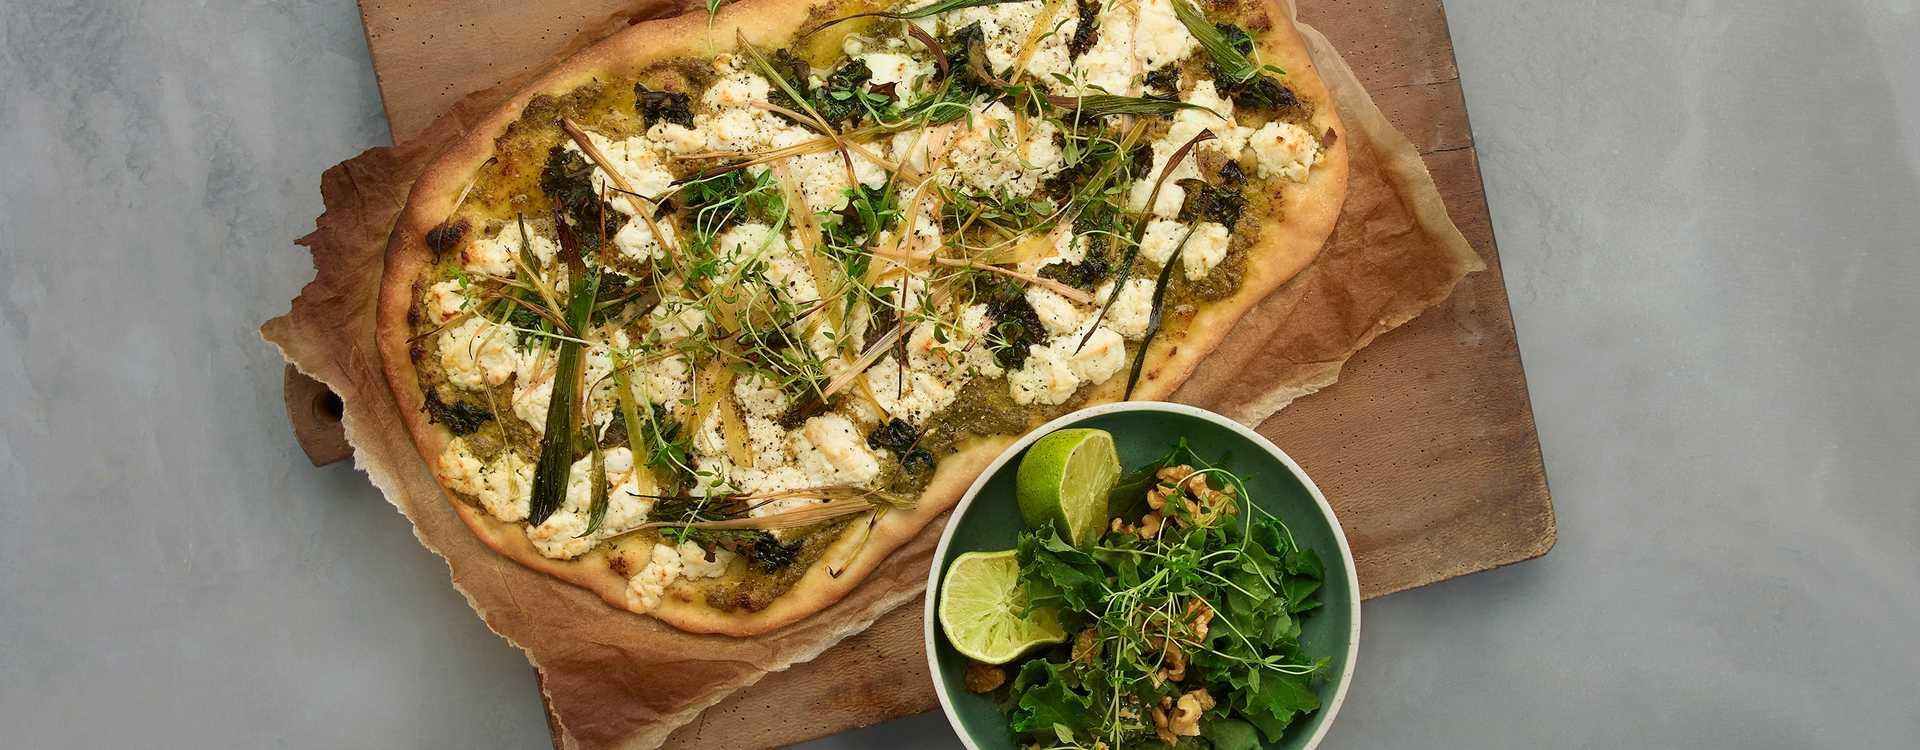 Grønn pizza med chevré, grønnkål, purre og pesto